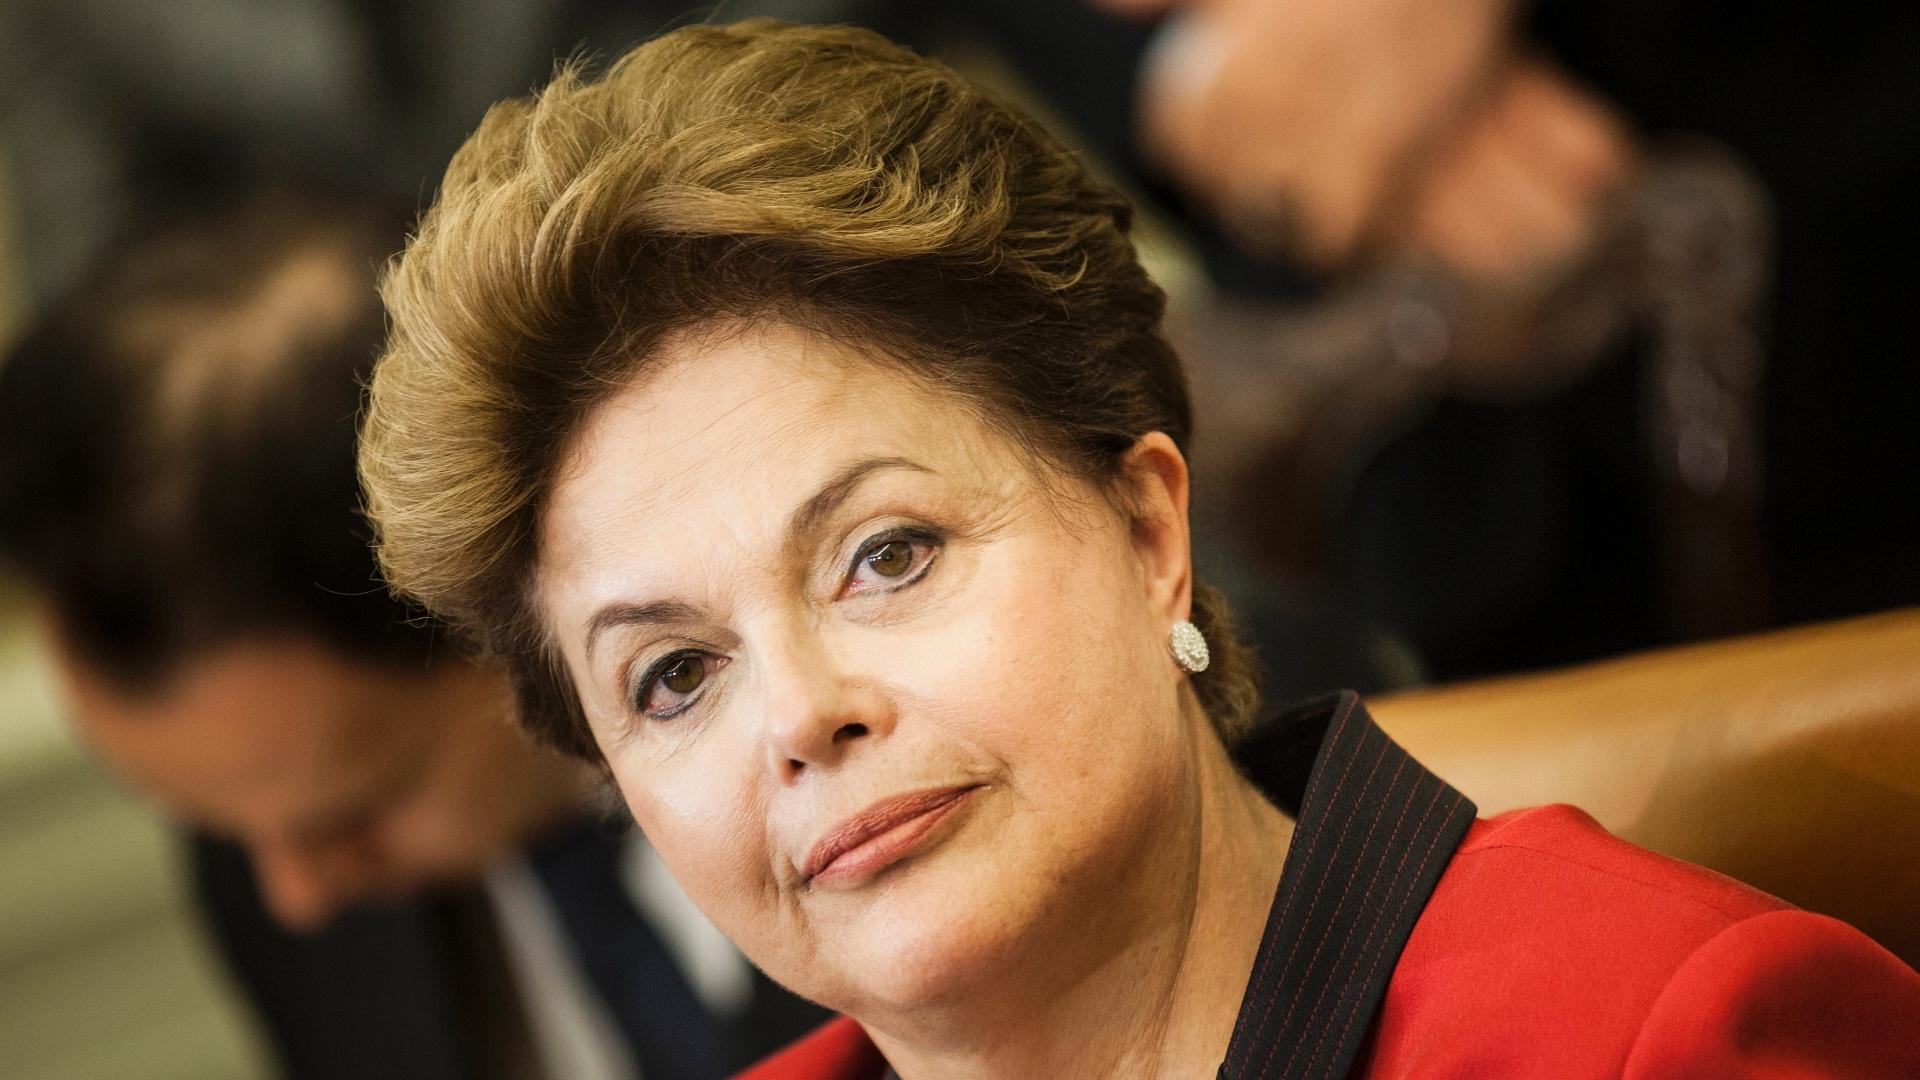 Dilma Roussef brasile reddito minimo